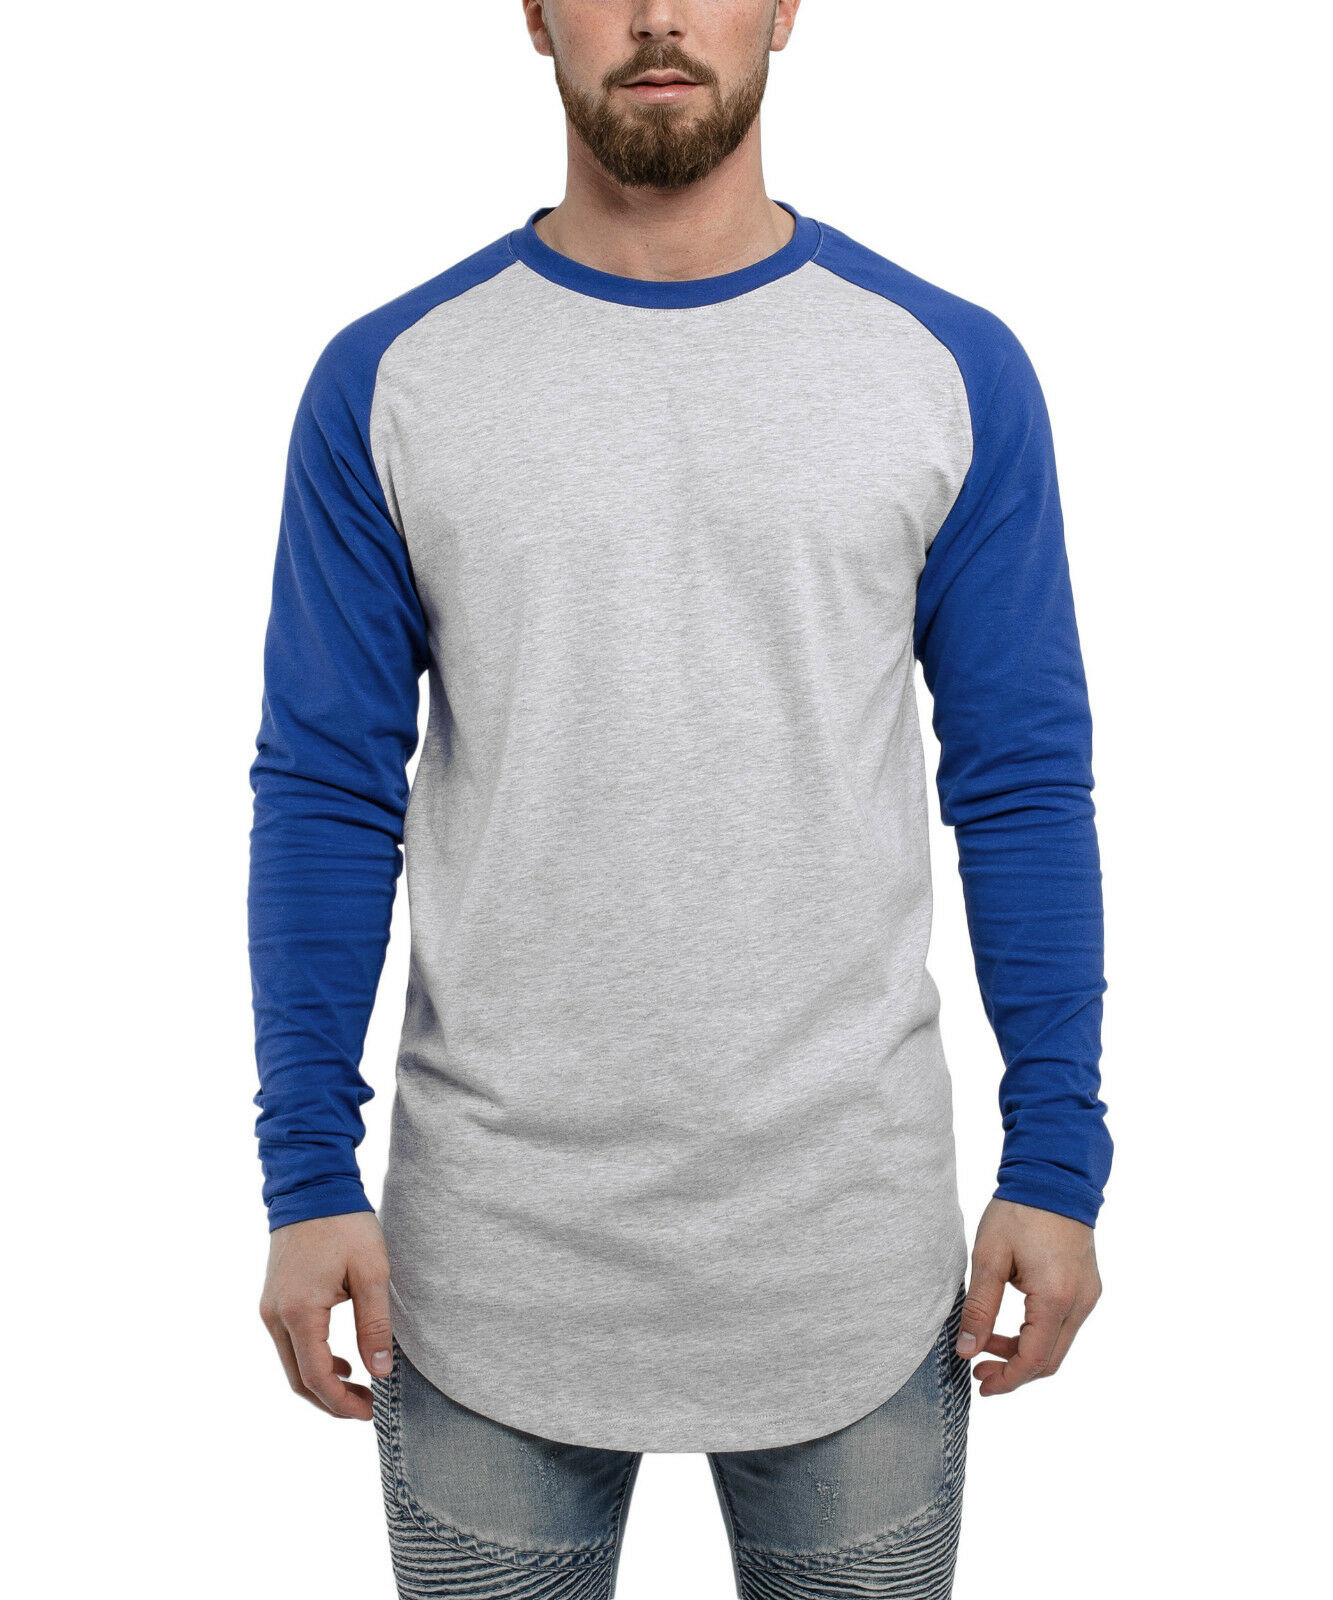 Blackskies Baseball T-Shirt Longshirt Grau-Blau Longline Herren Men Long Basic